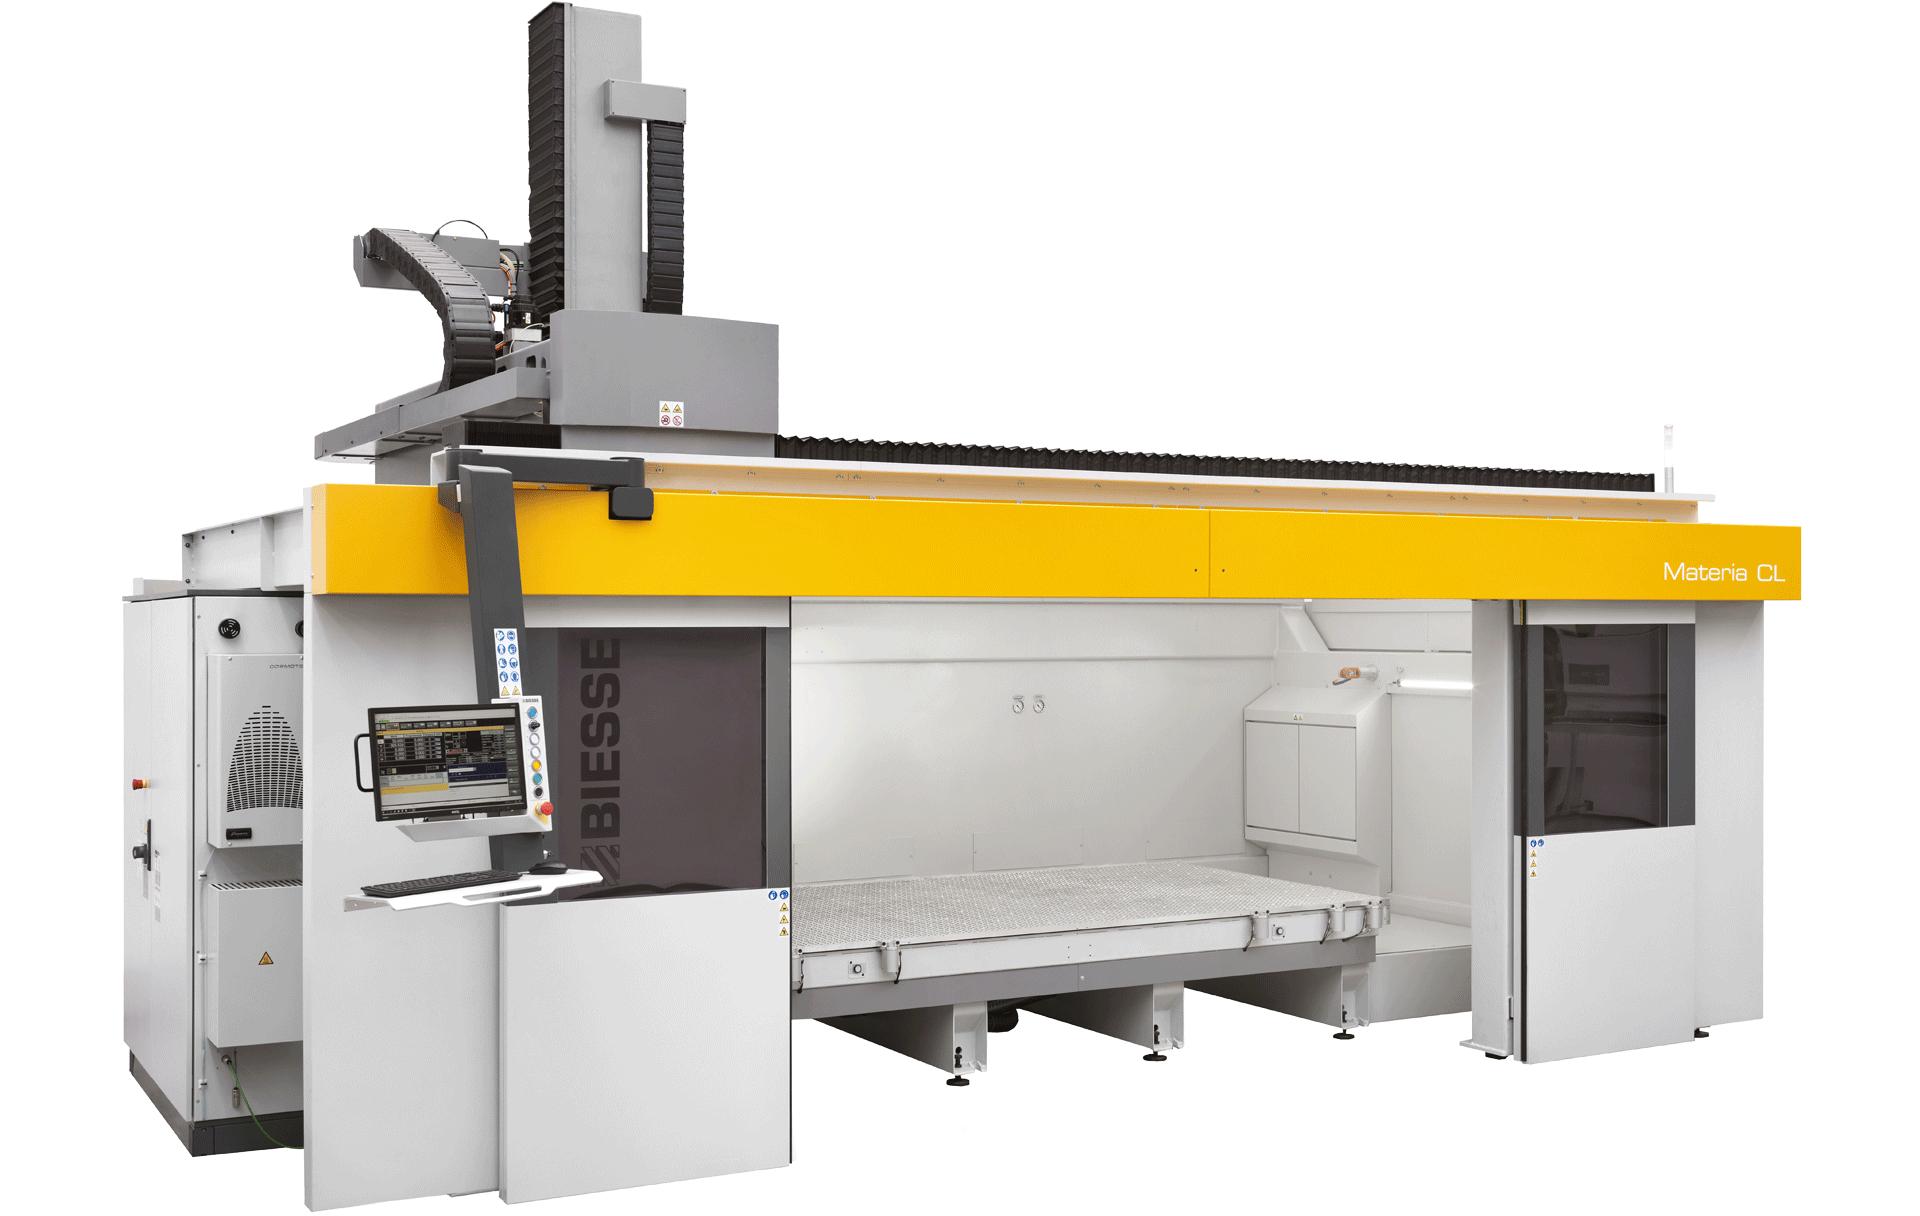 5 axis cnc machine plastic MATERIA CL: Photo 2